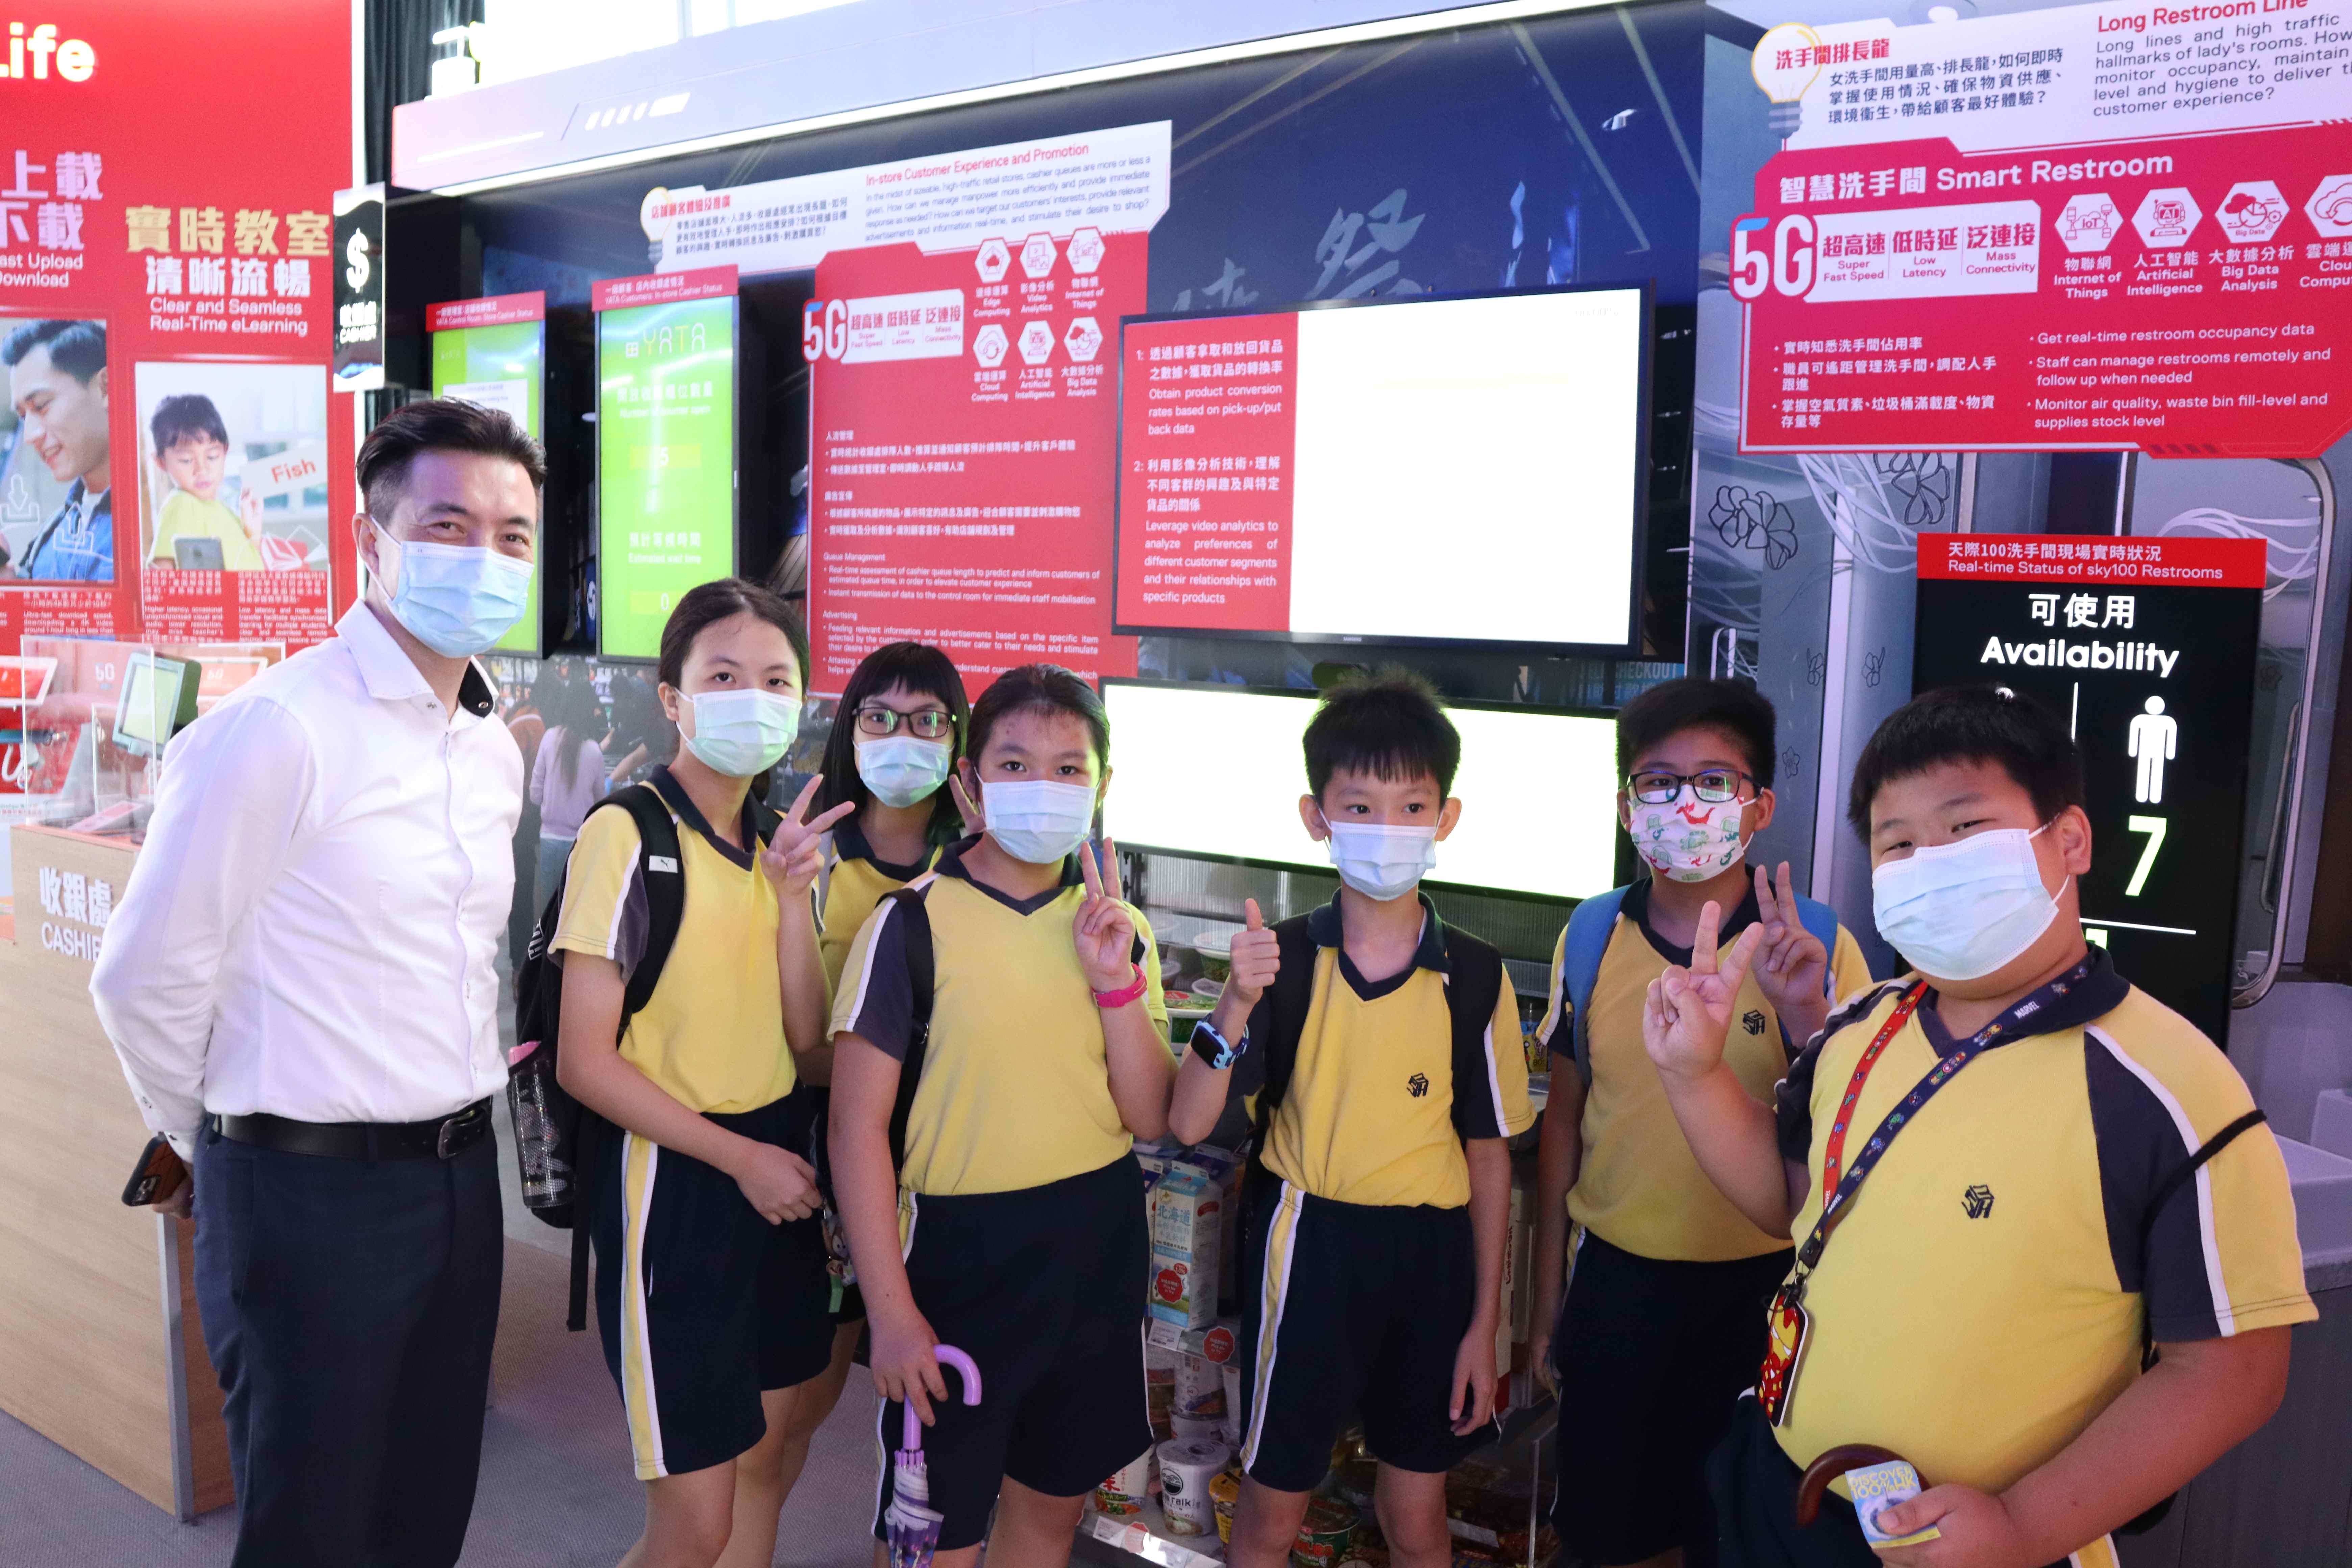 https://syh.edu.hk/sites/default/files/img_0475.jpg